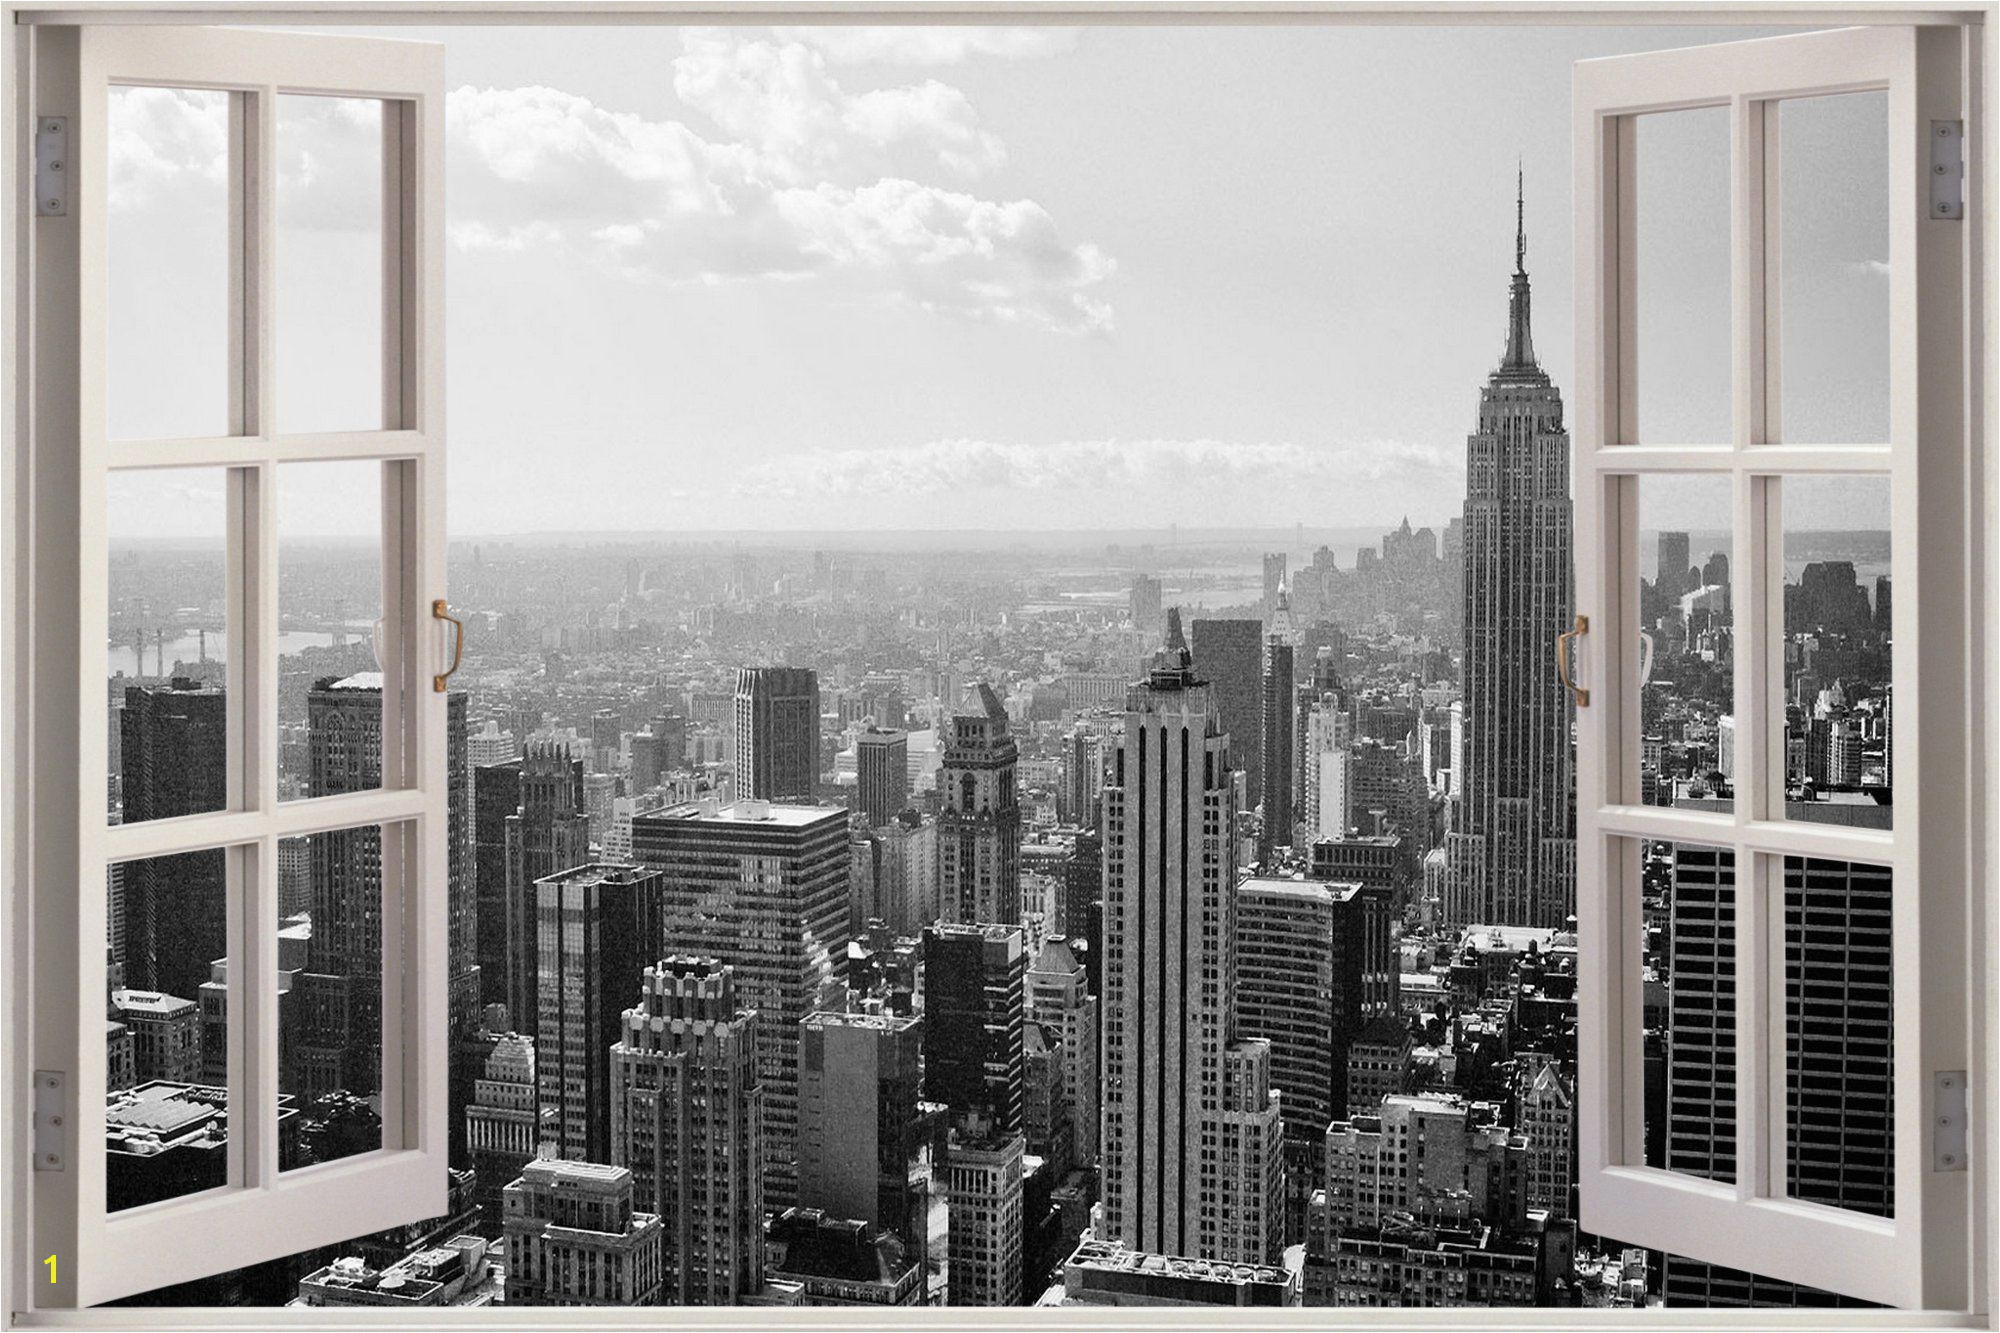 New York Skyline Window Wall Mural Huge 3d Window New York City View Wall Stickers Mural Art Decal